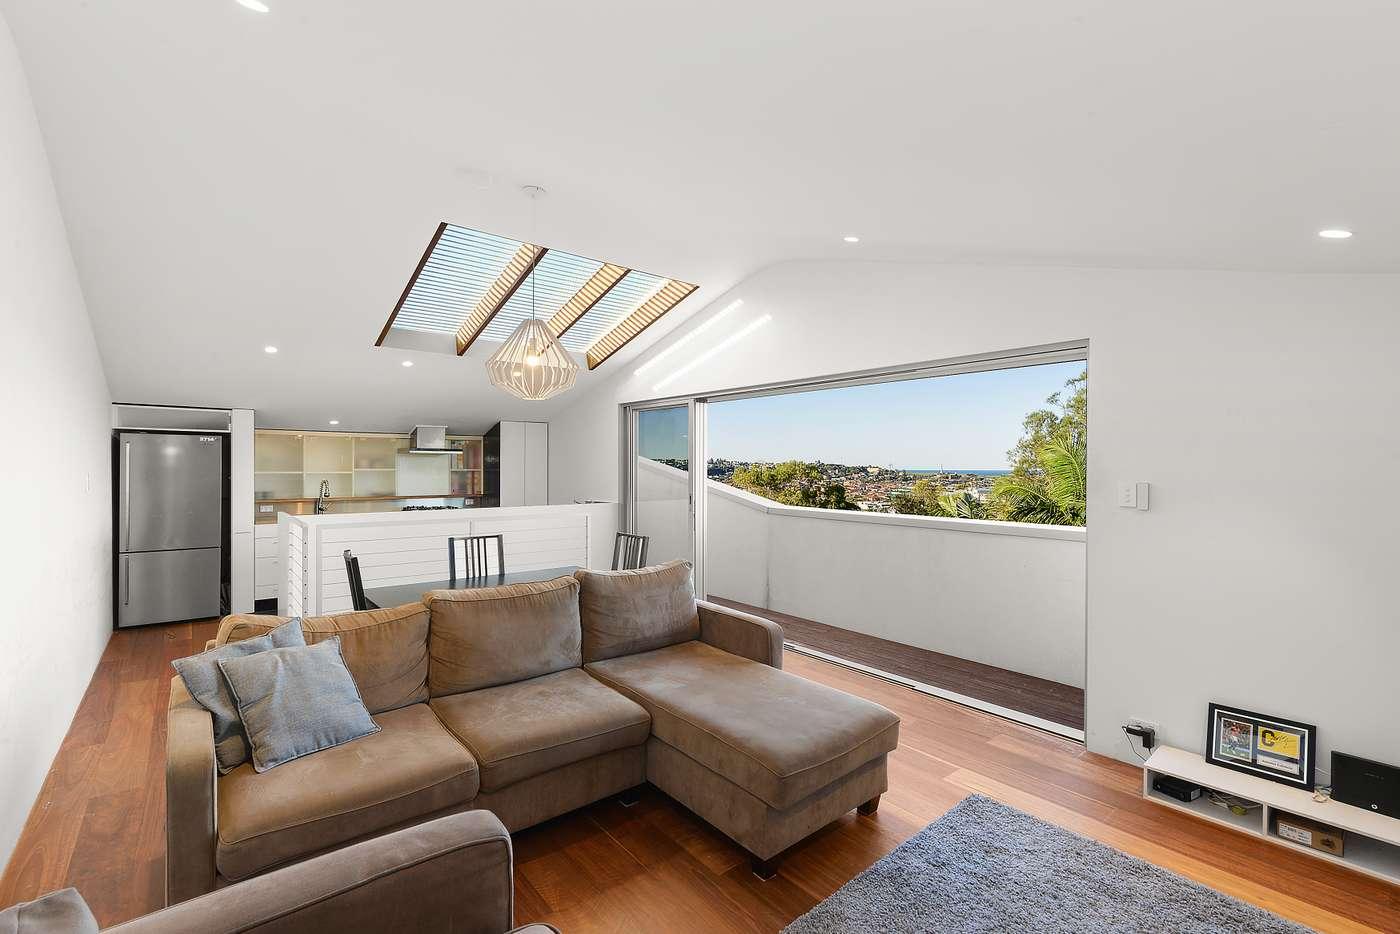 Main view of Homely apartment listing, 4/52 Edward Street, Bondi NSW 2026